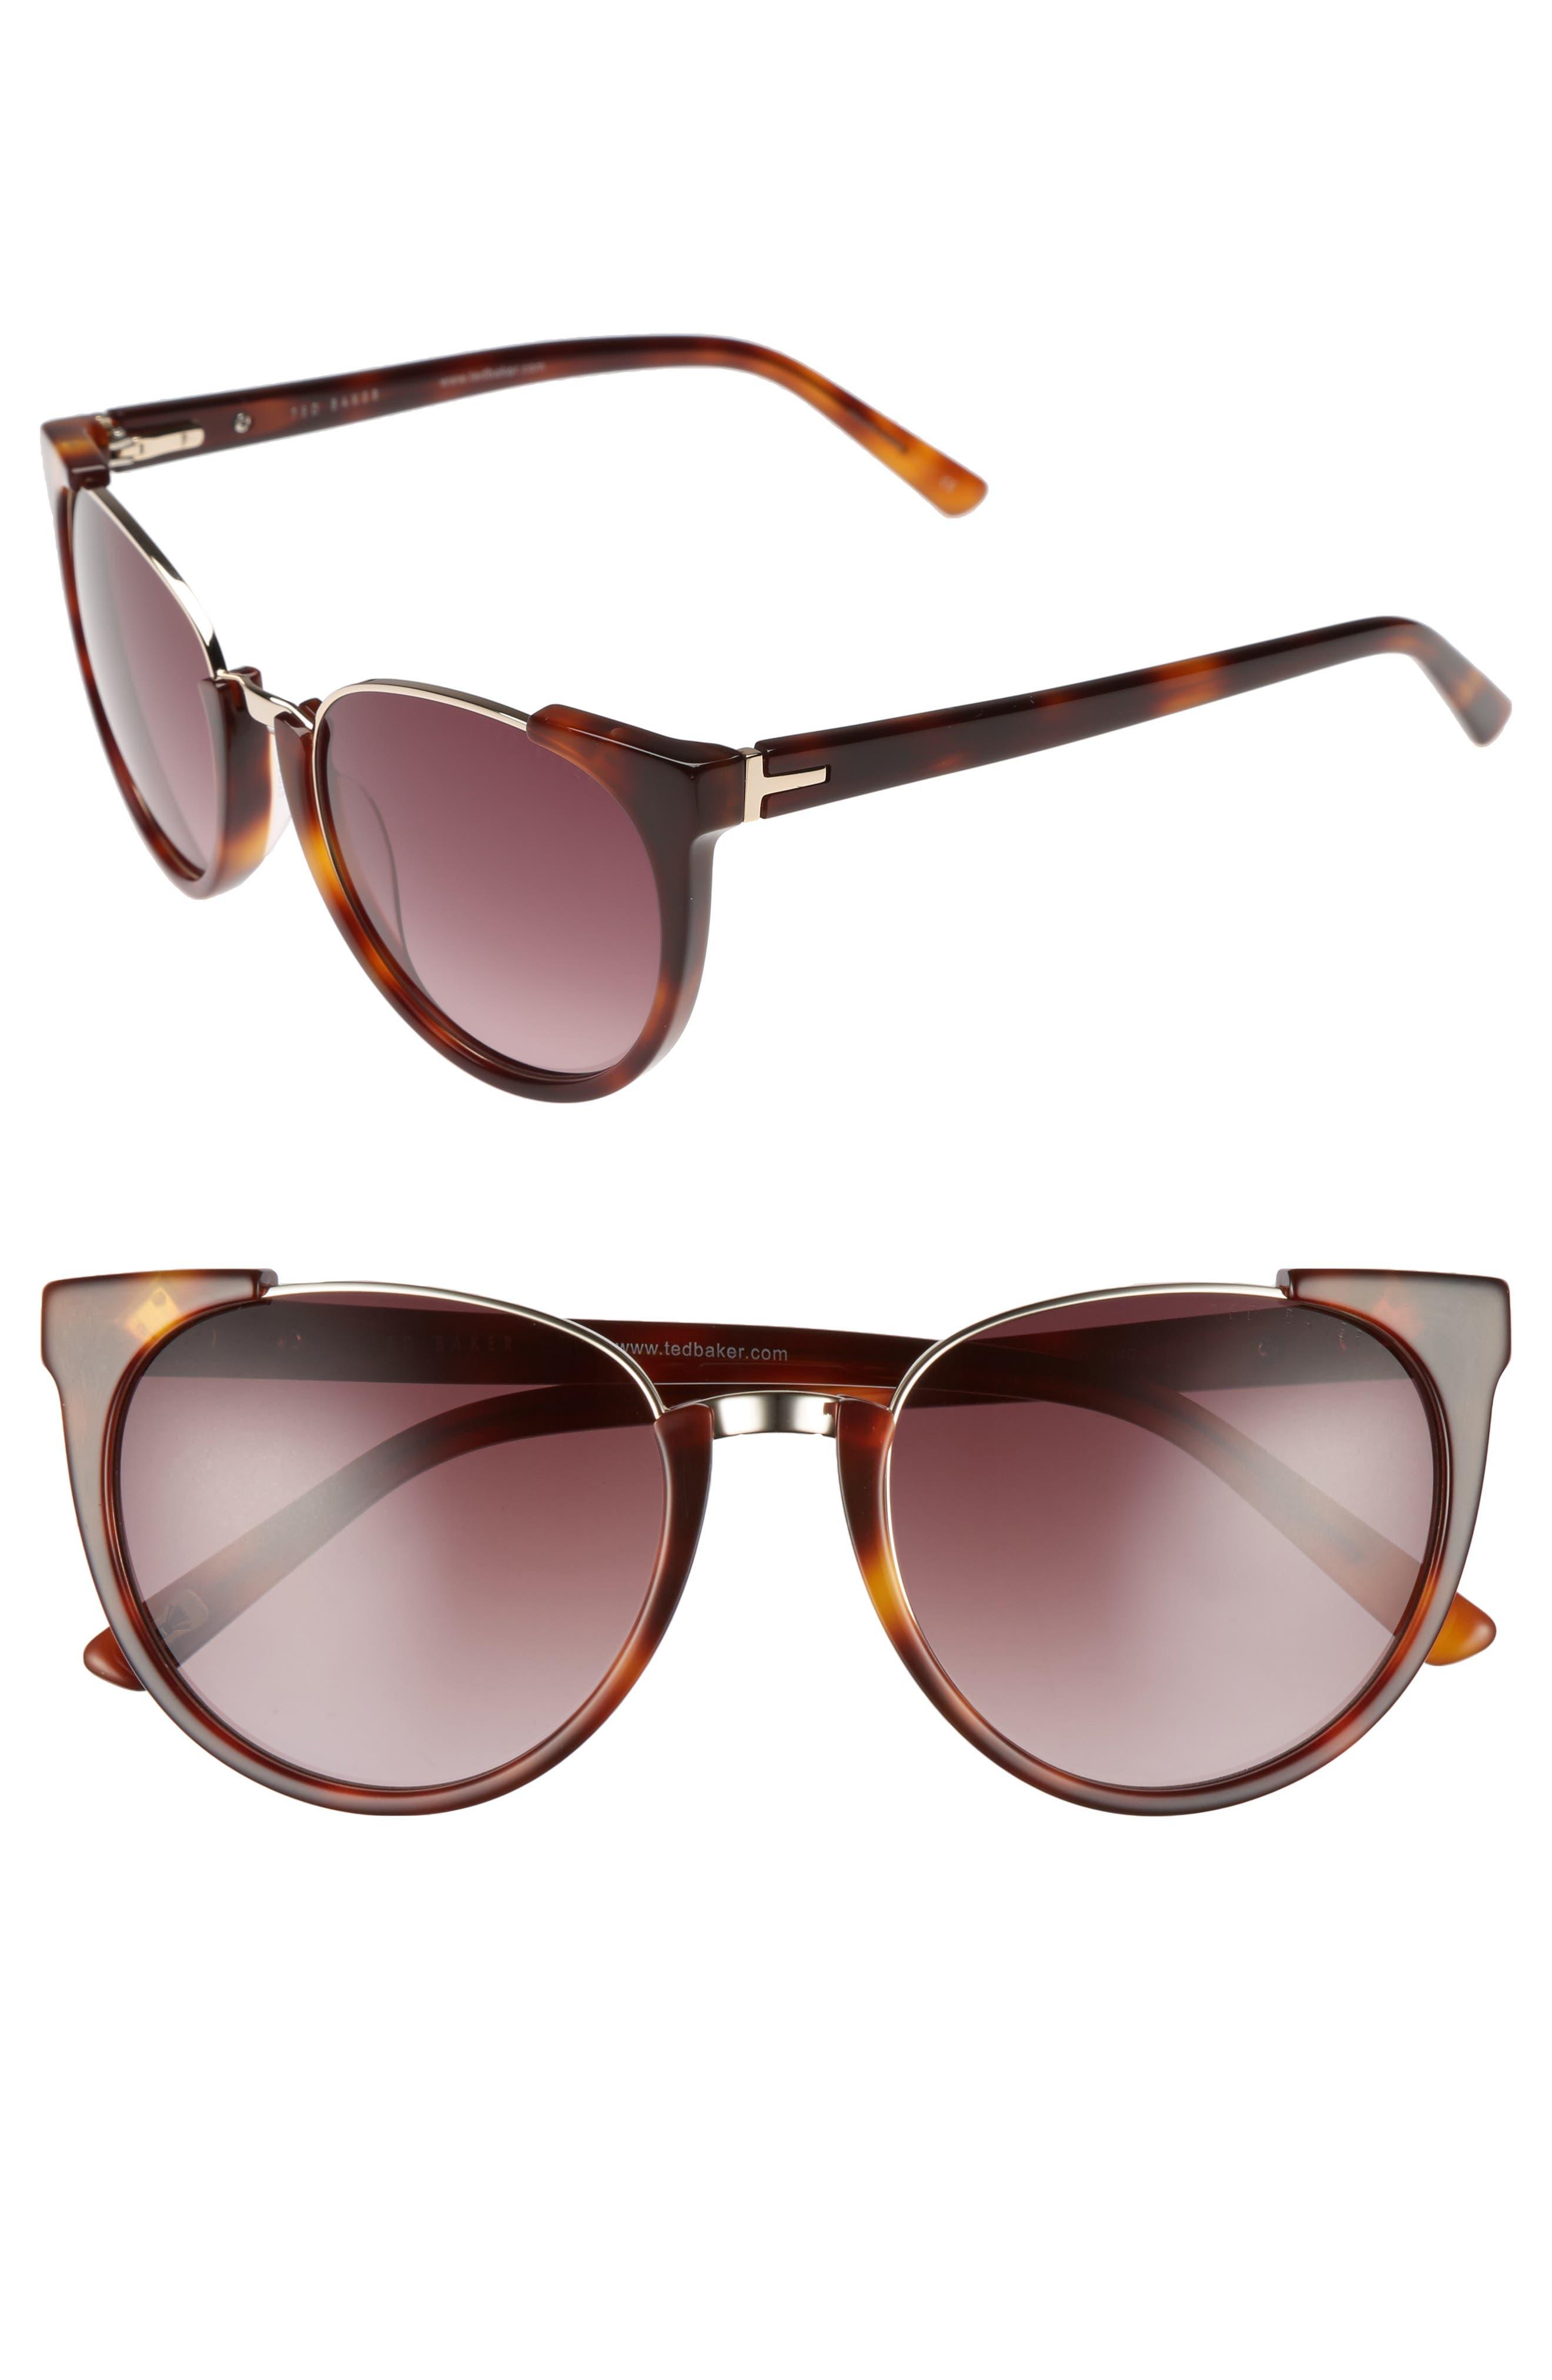 53mm Modified Oval Sunglasses,                         Main,                         color, 200